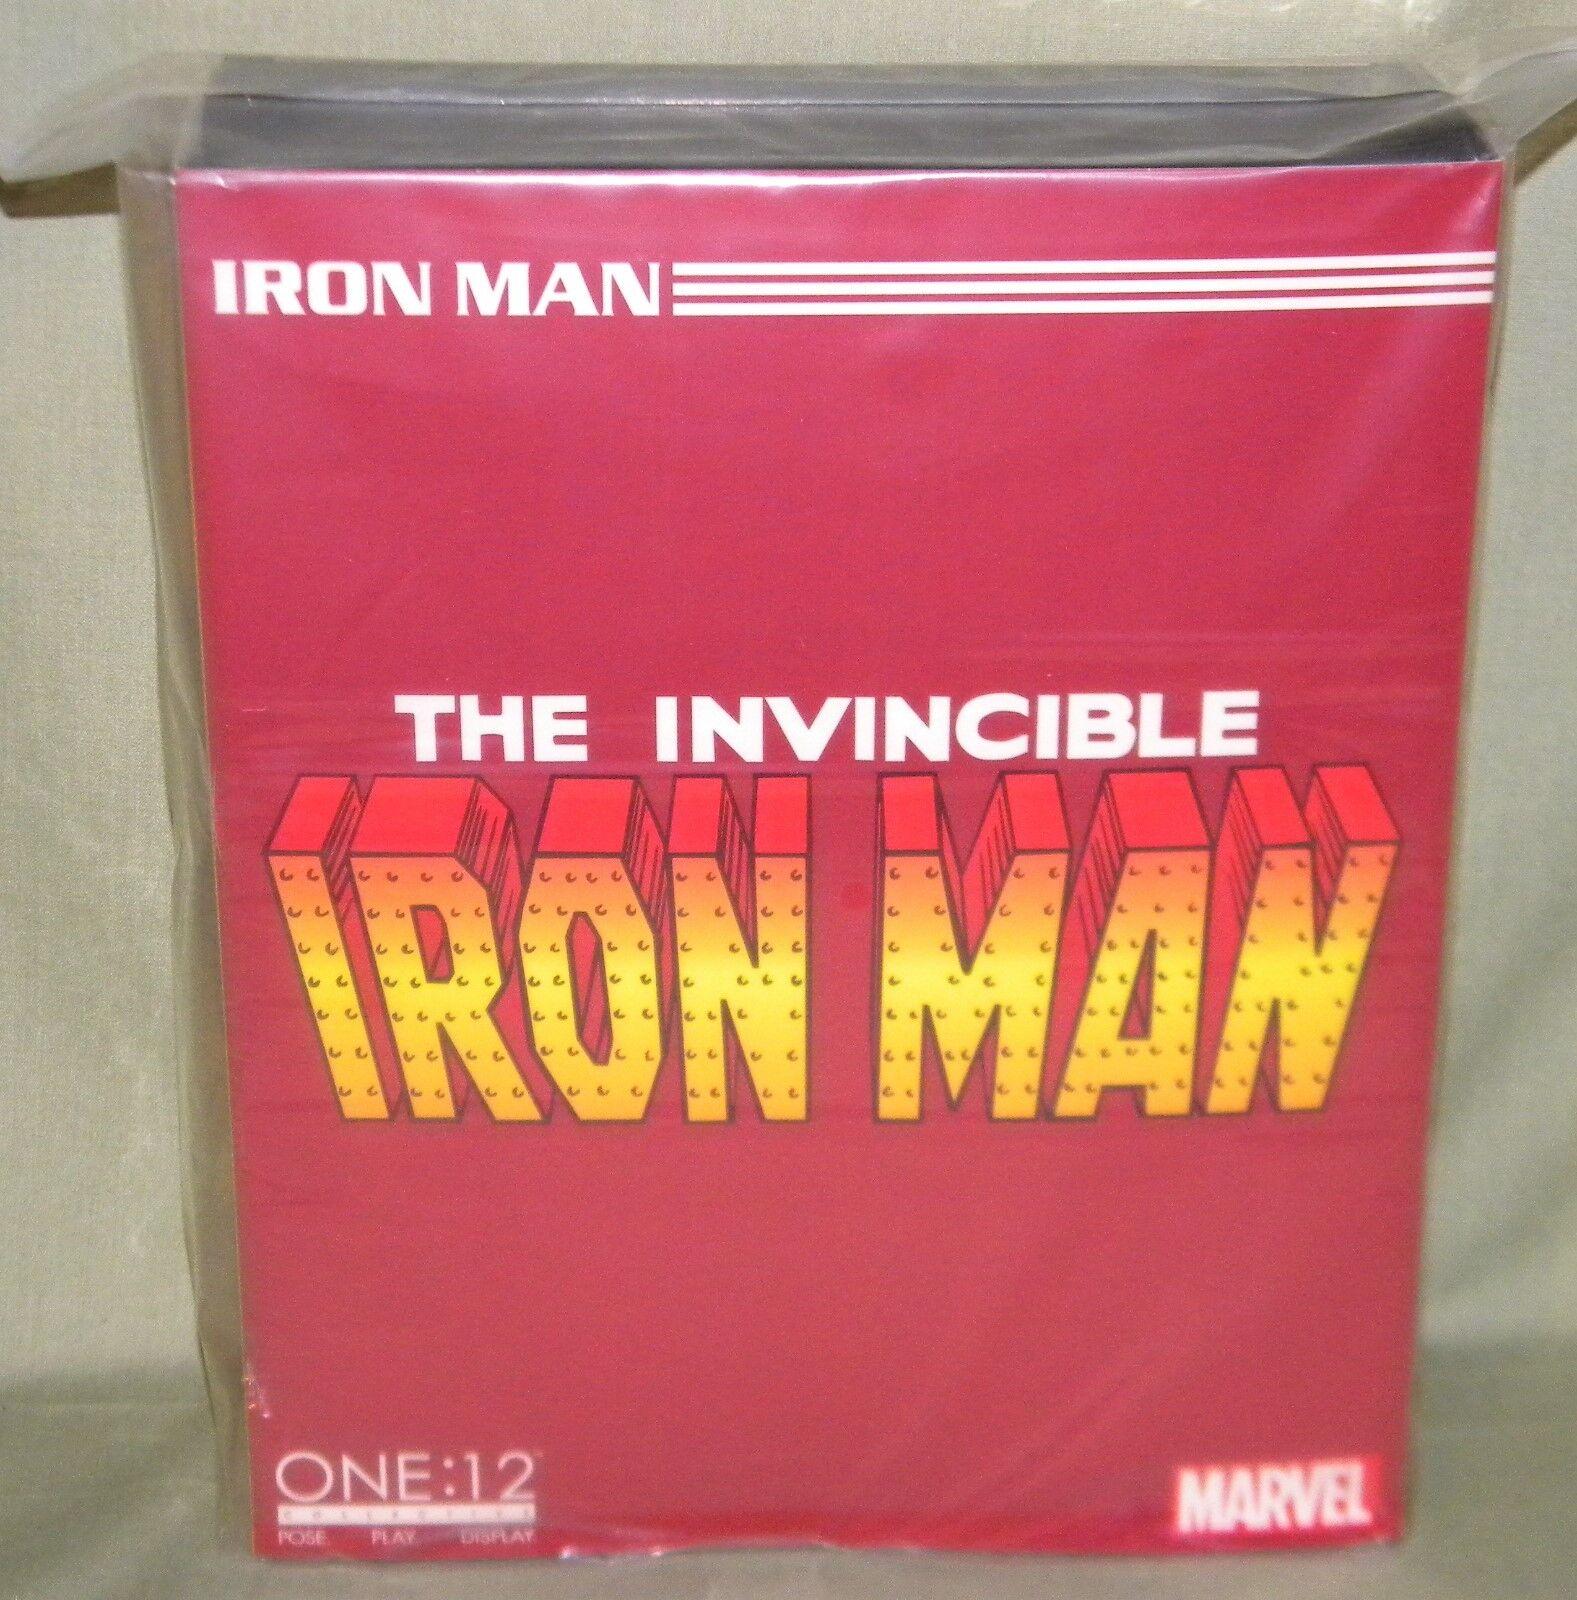 UNVERSTÄNDLICH IRON MAN One 12 Kollektiv Action Figure MEZCO TOYZ Marvel Avengers